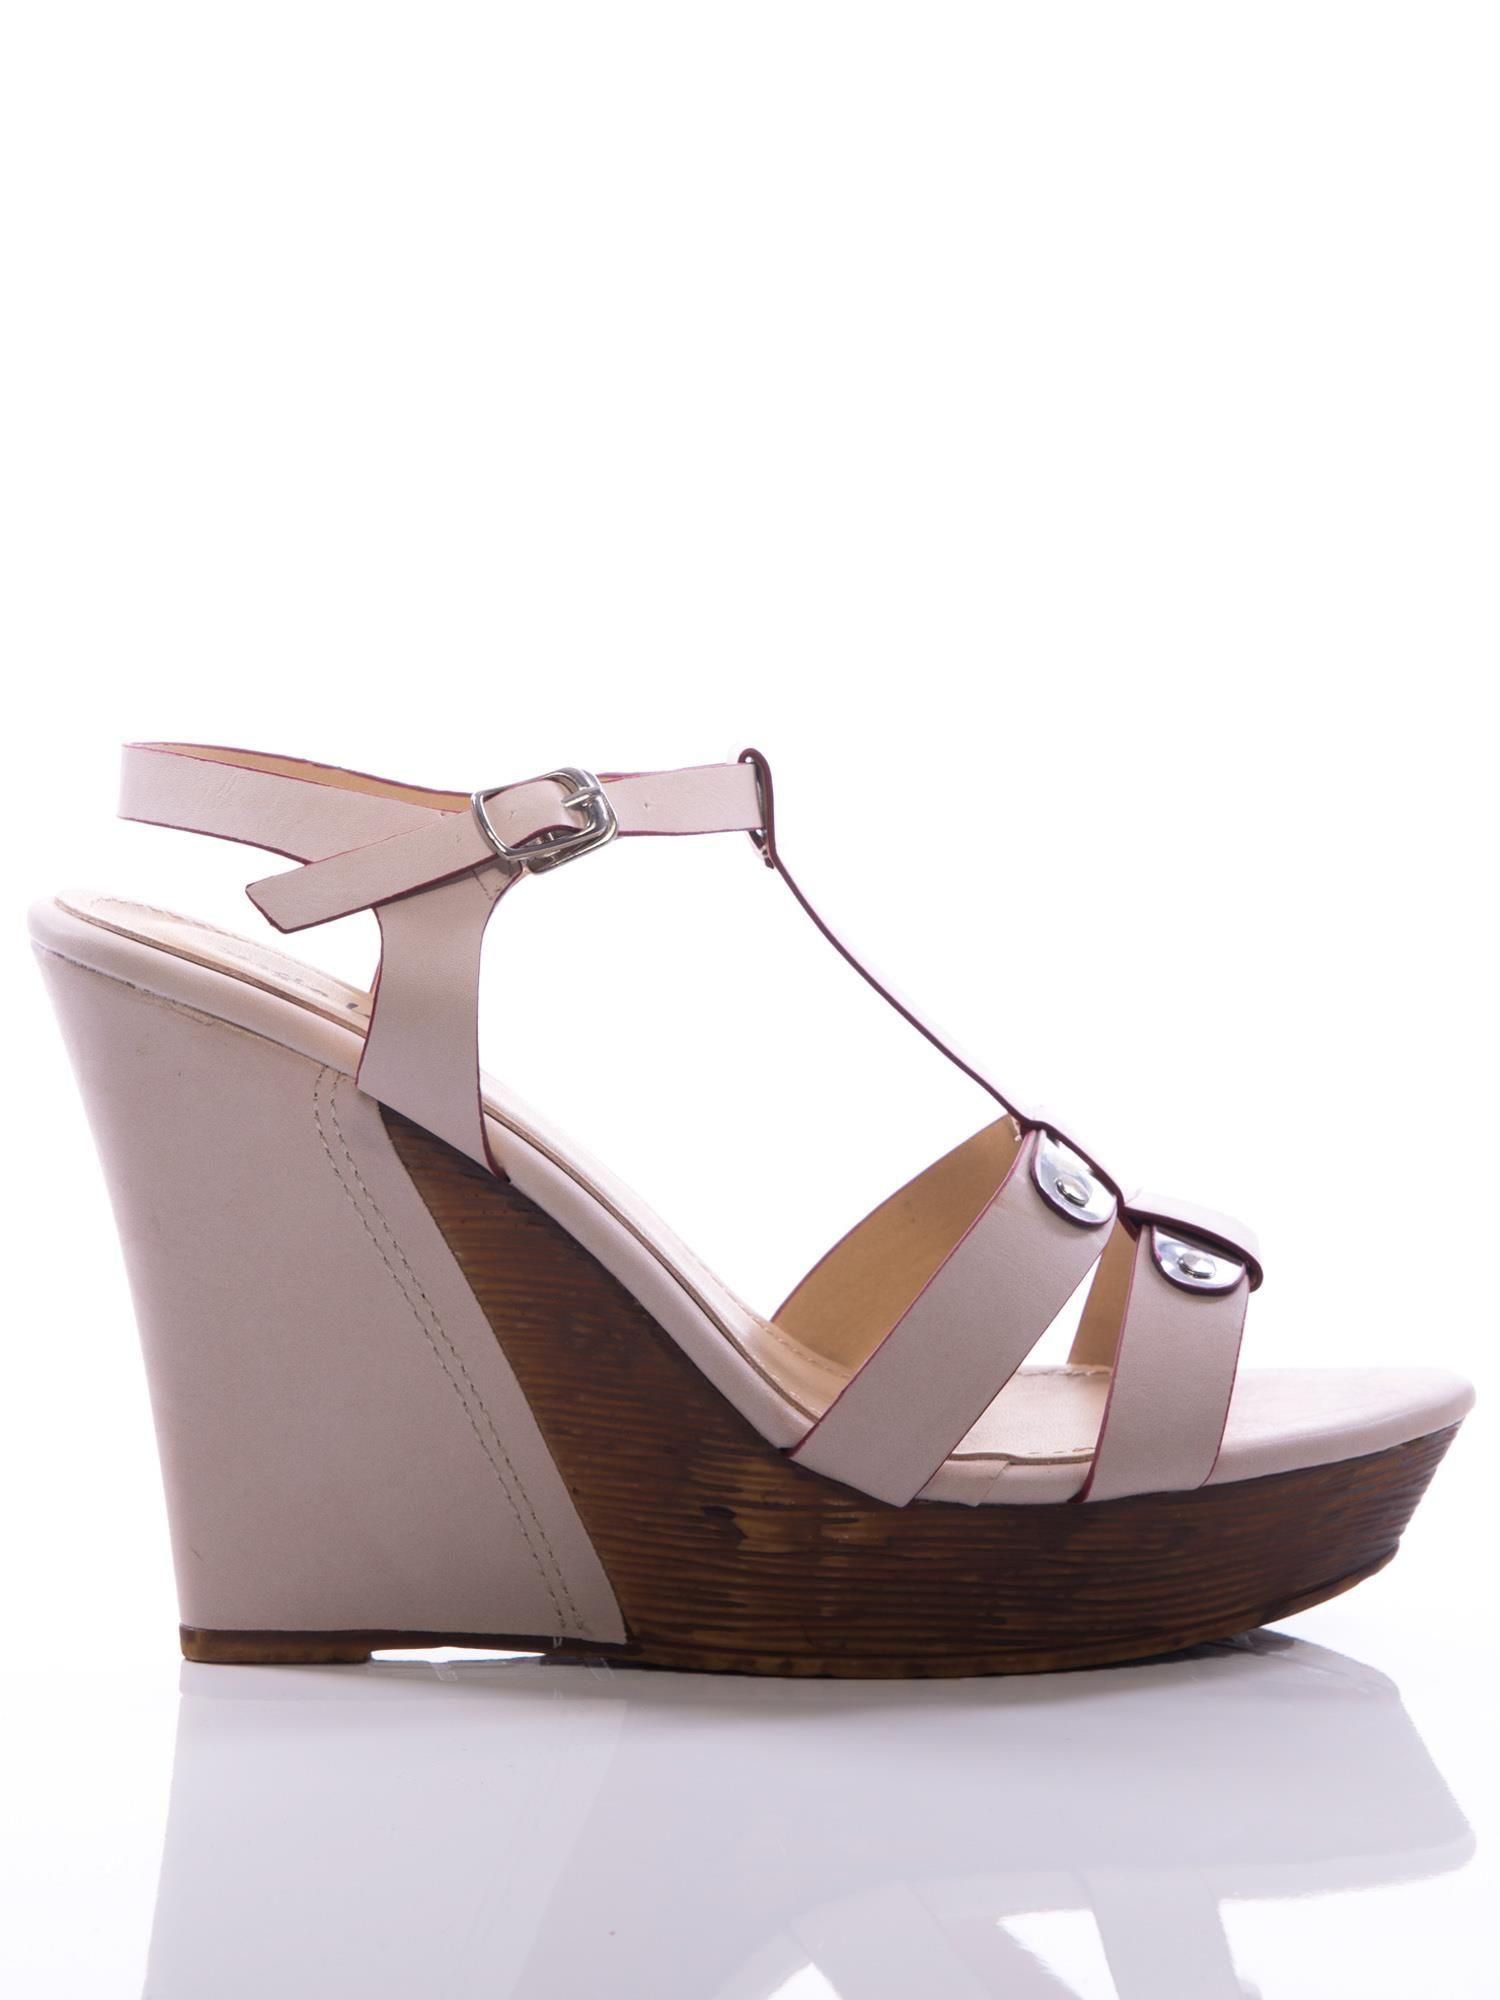 972f83a5029d0 Kremowe sandały Sergio Leone na koturnach - Buty Sandały na koturnie ...